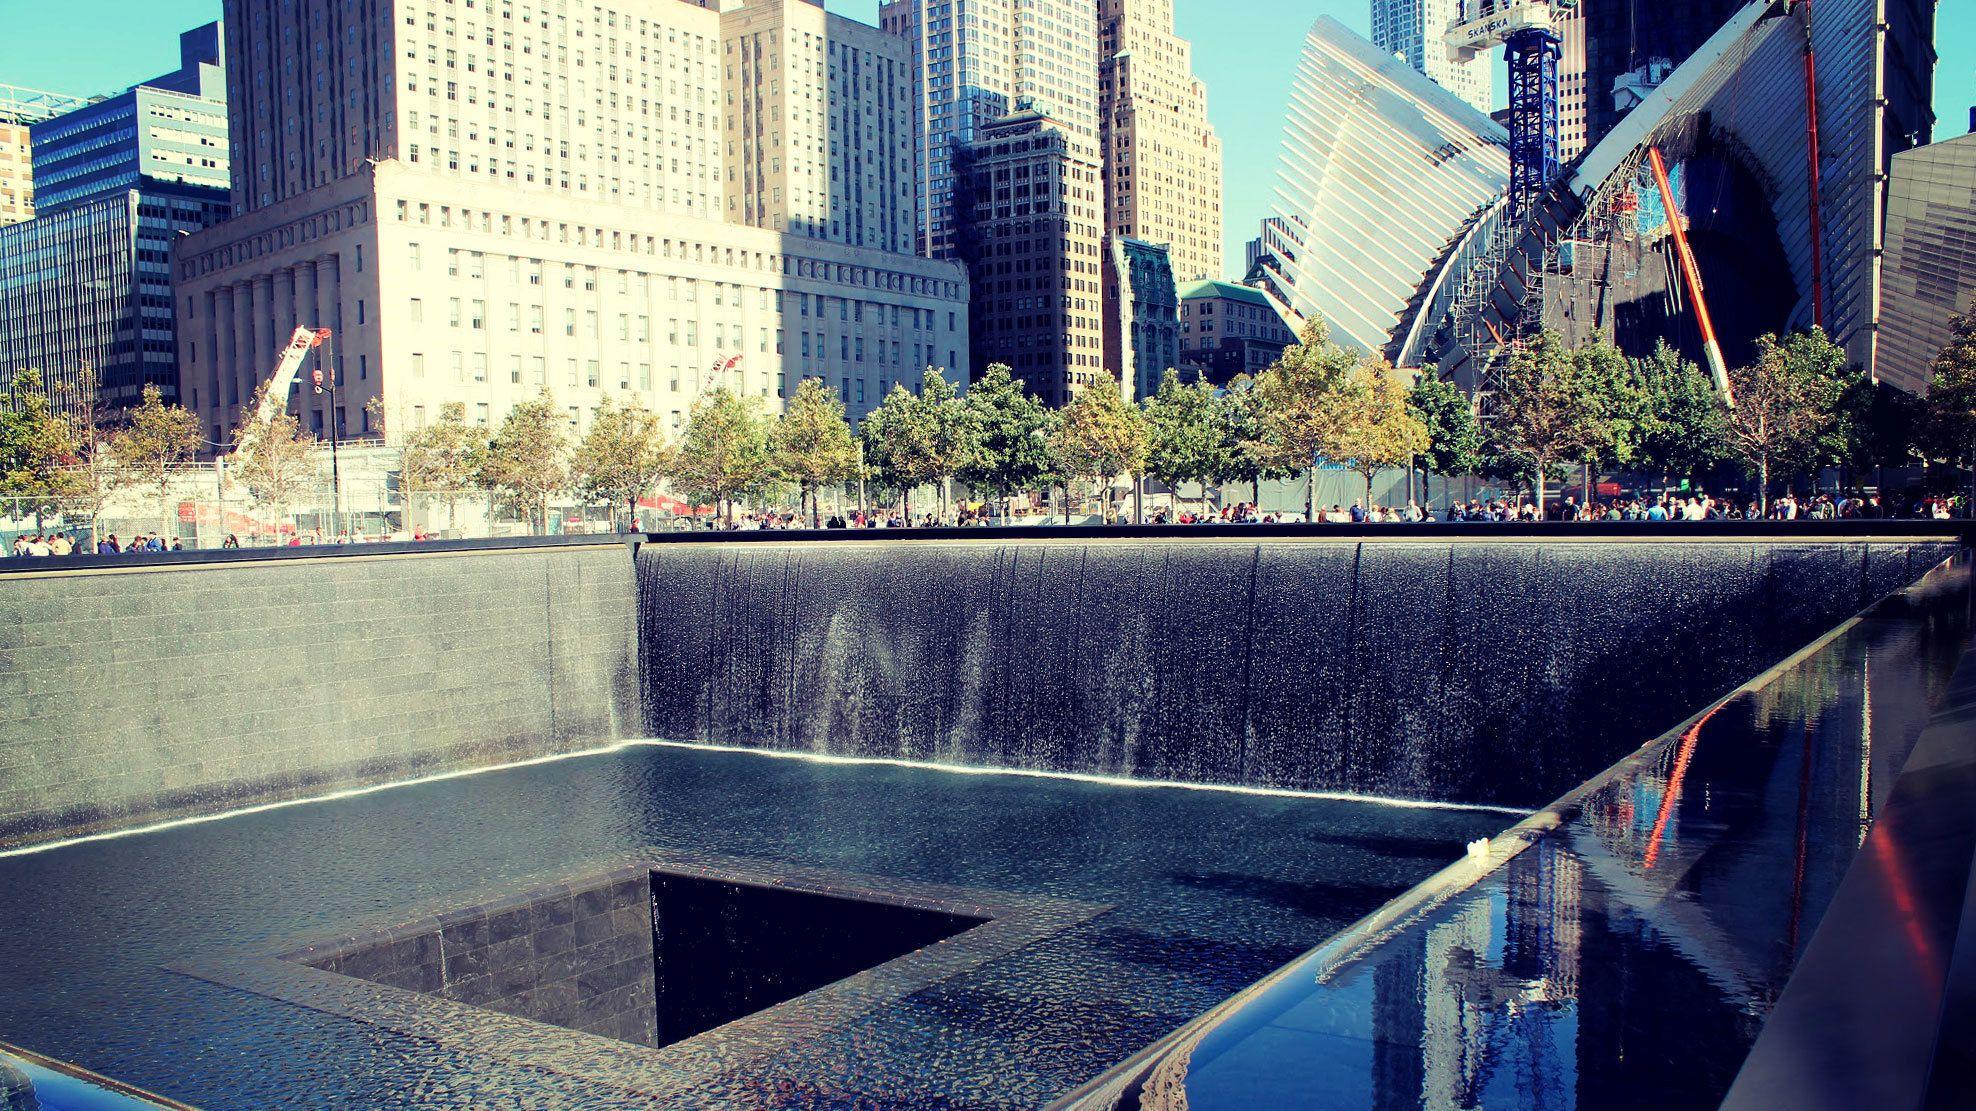 9/11 Ground Zero Tour with Optional 9/11 Museum Tickets